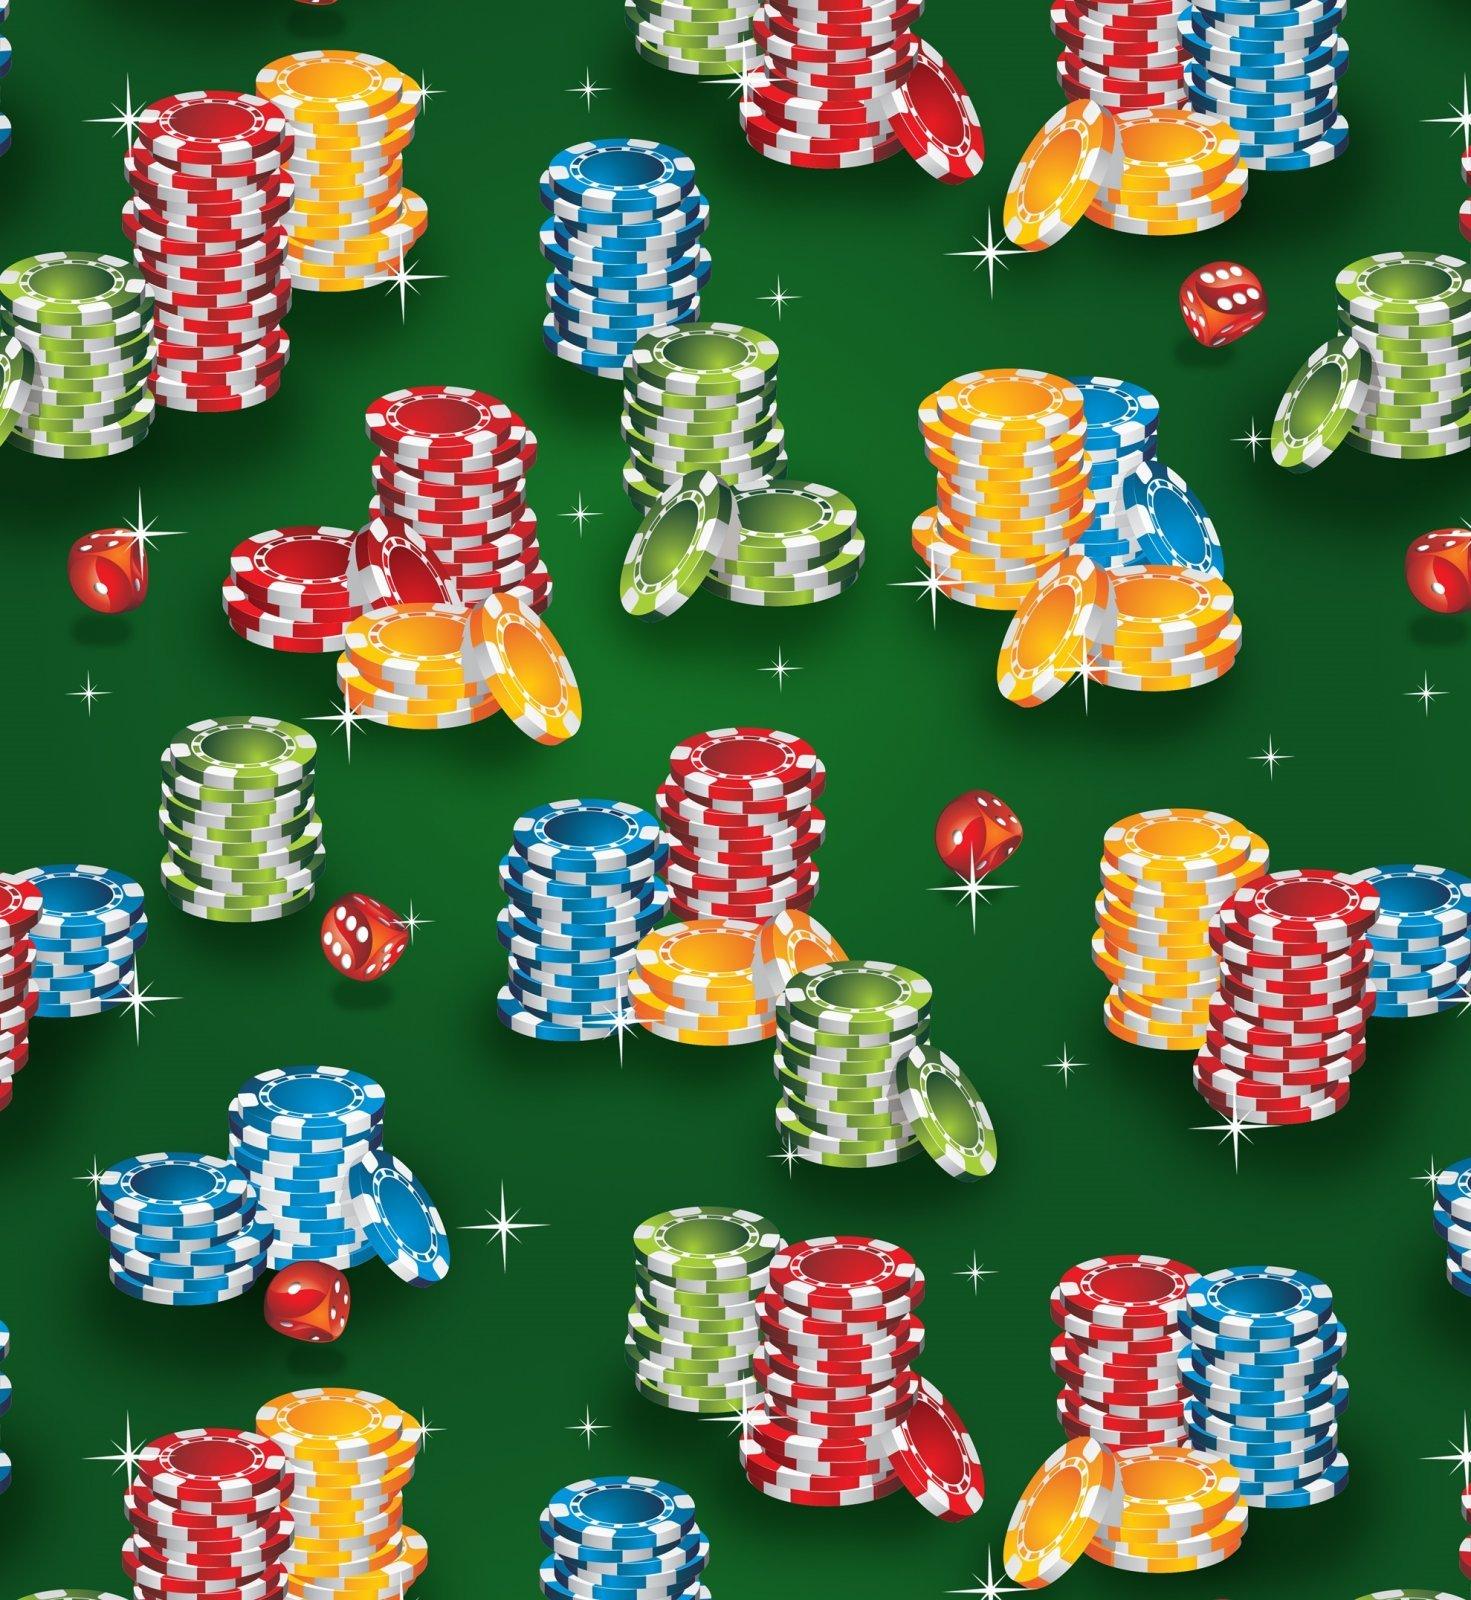 Casino 2562 Poker Chip Piles Green